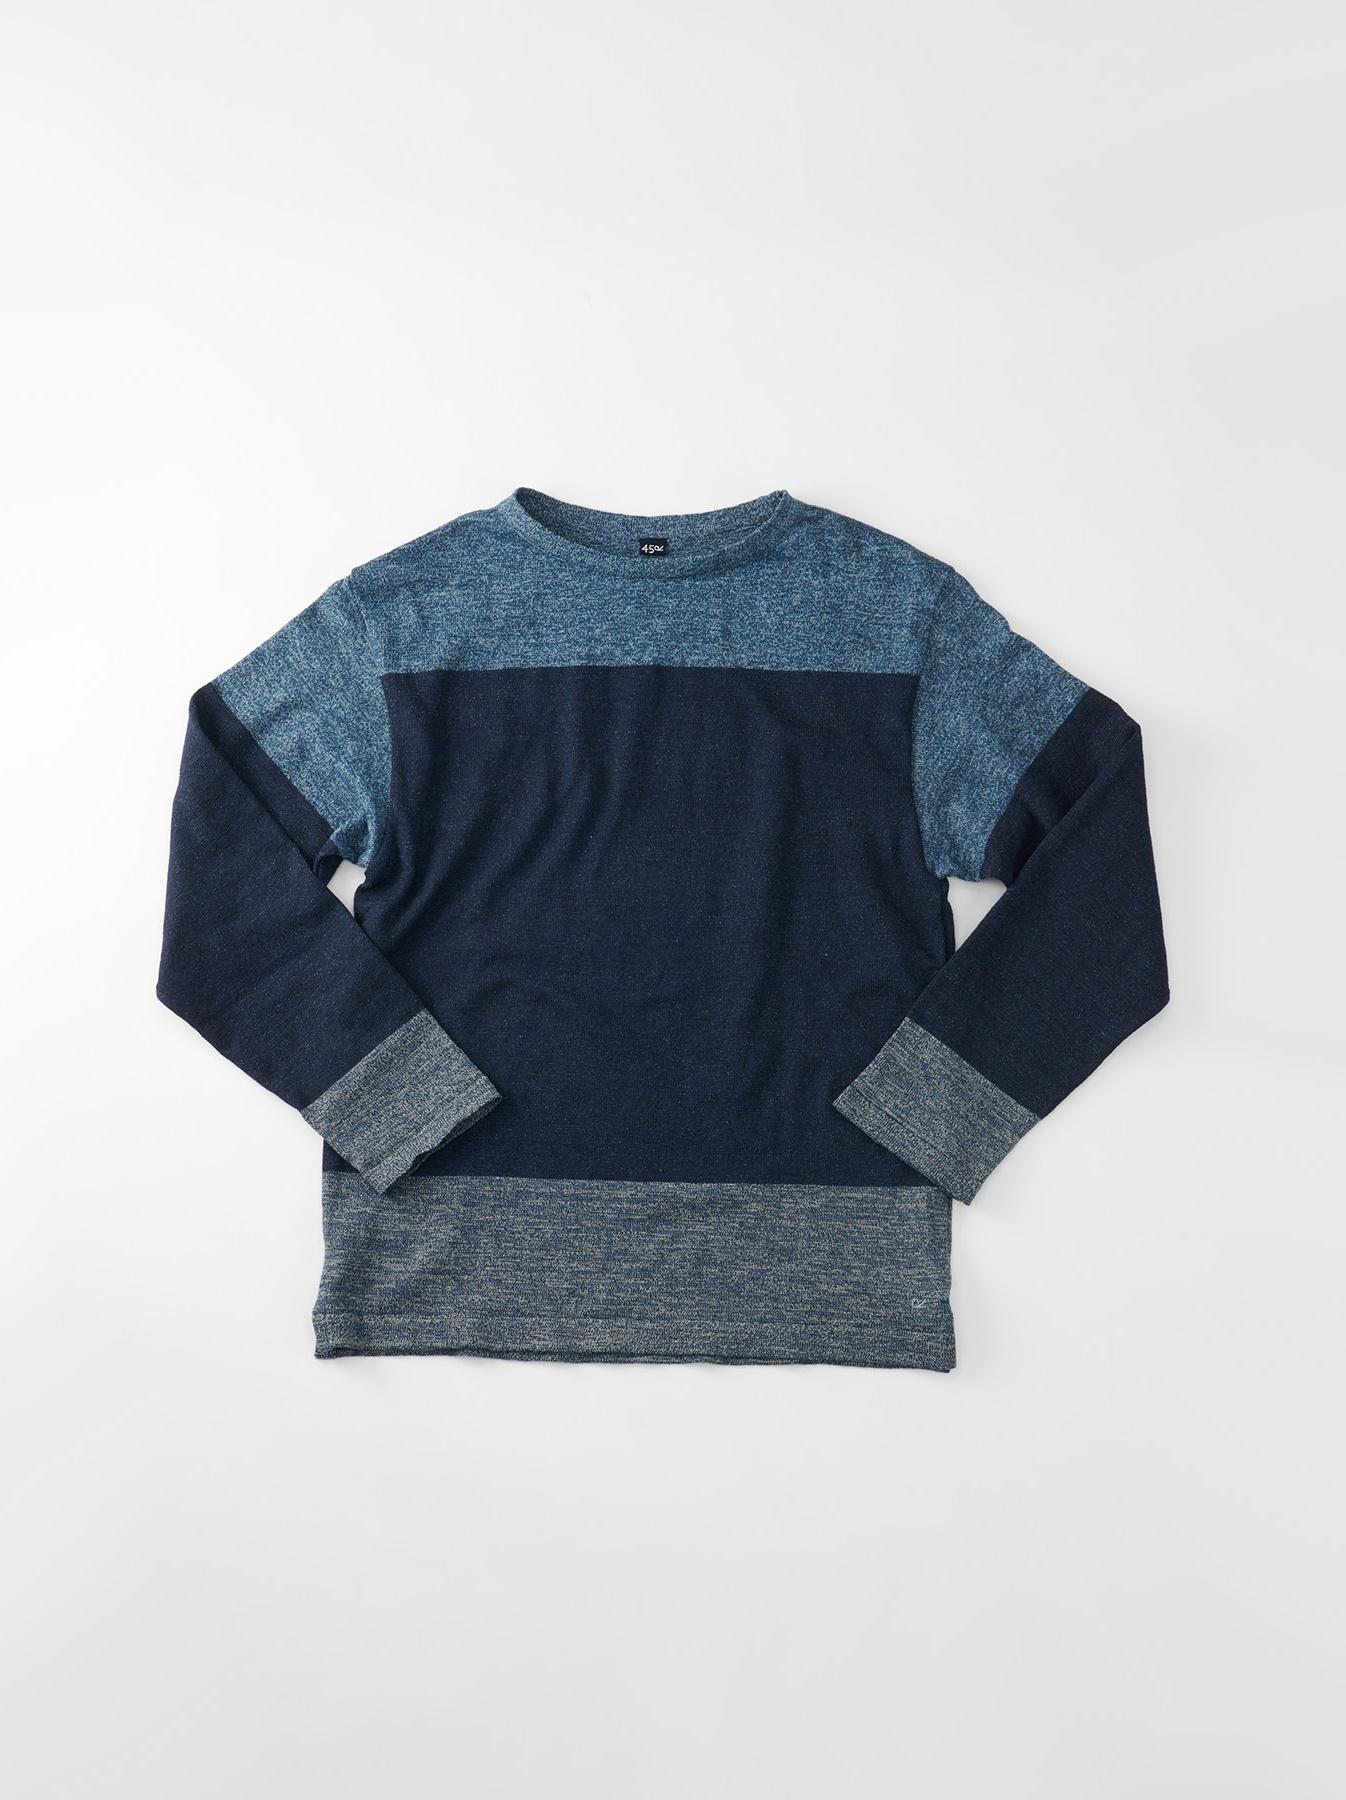 WH Gauze Basque Knit T-shirt-1